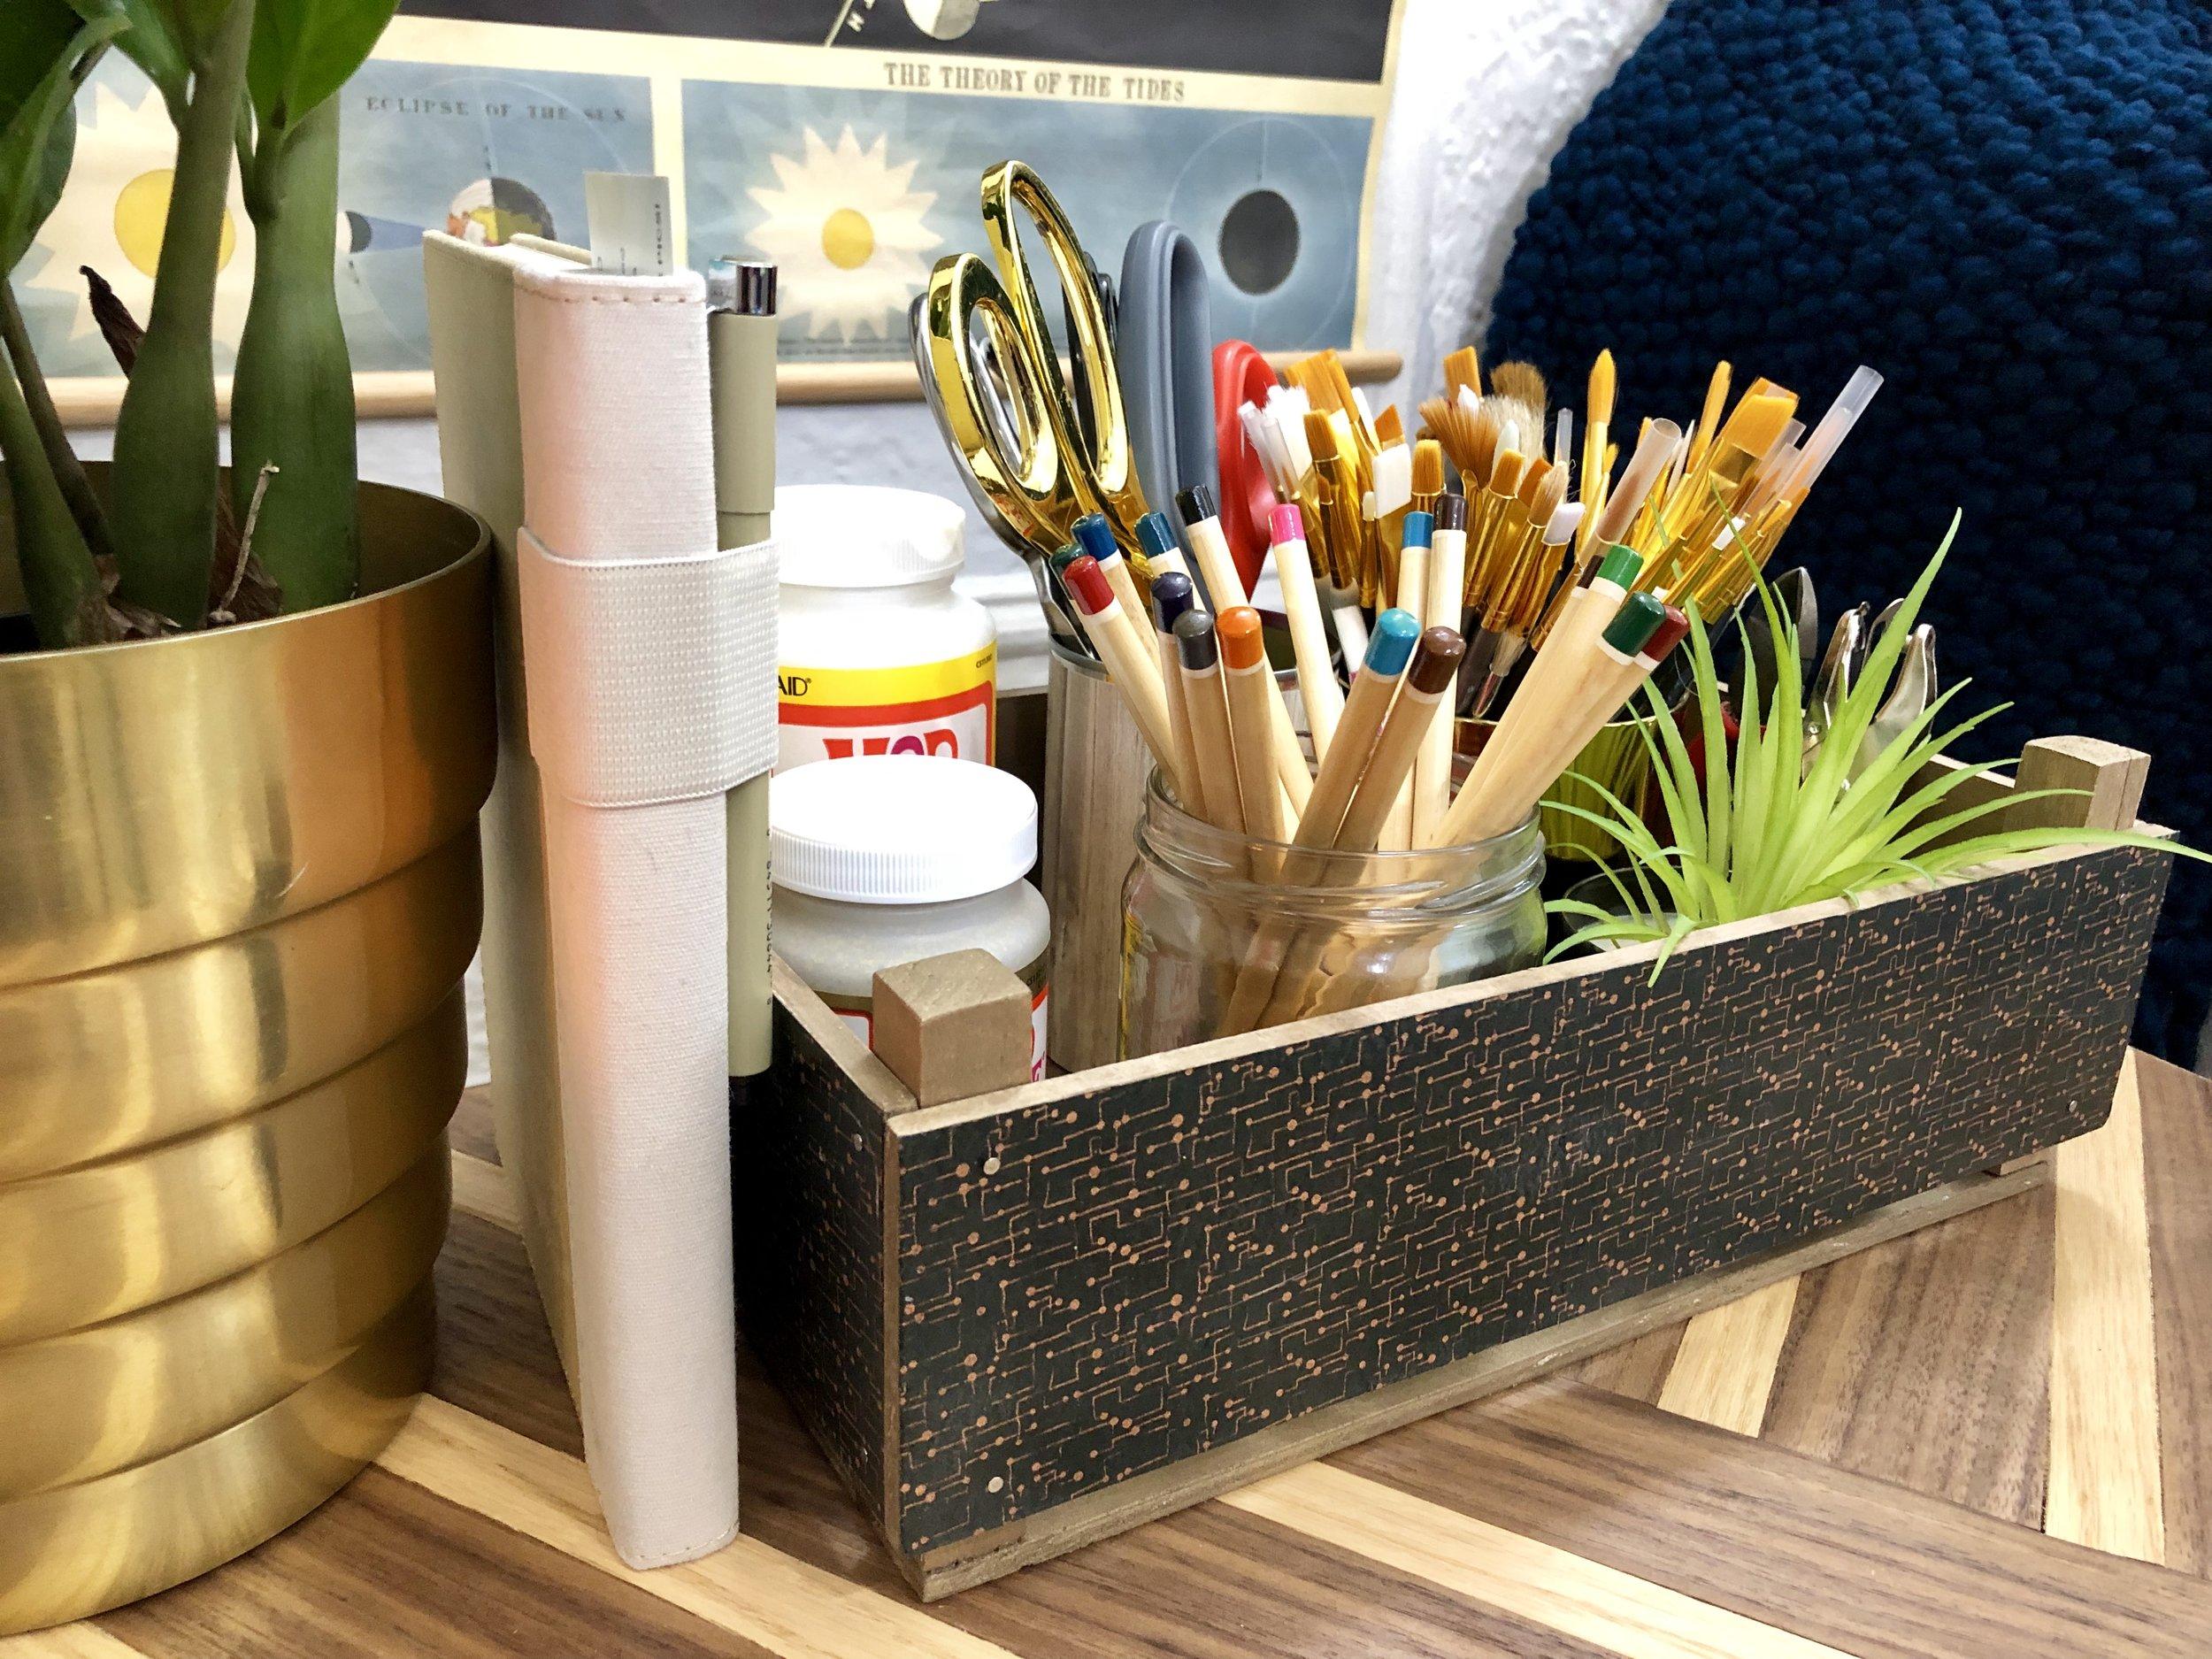 DIY Clementines Inspired Wooden Craft Box DIY using balsa wood  #storageorganization #apartmentideas #diyhomedecor #diycrafts #diywoodprojects #plaidcrafts #craftsupplies